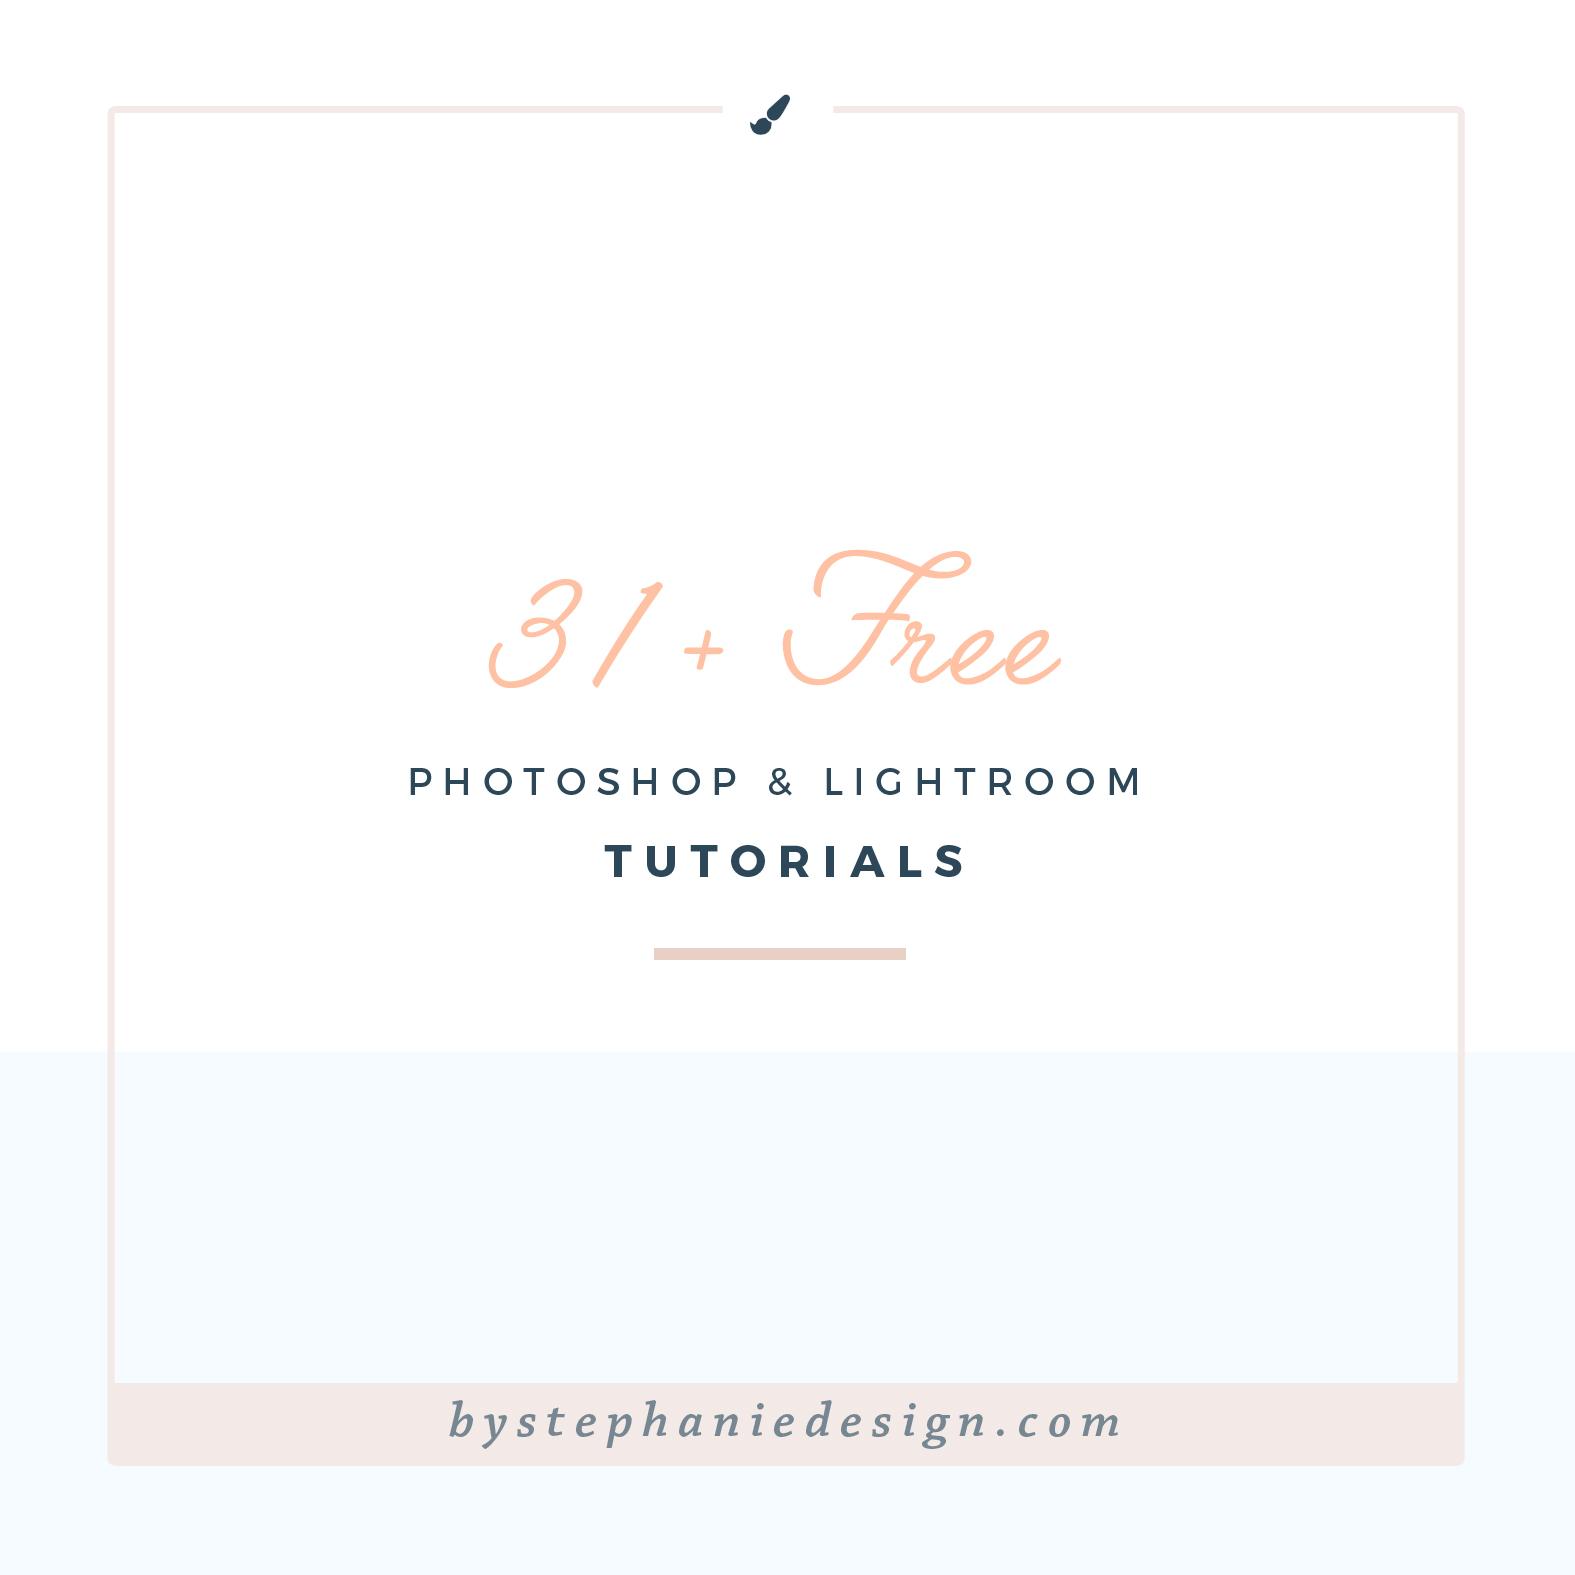 free photoshop tutorials - learn to edit photos - By Stephanie Design